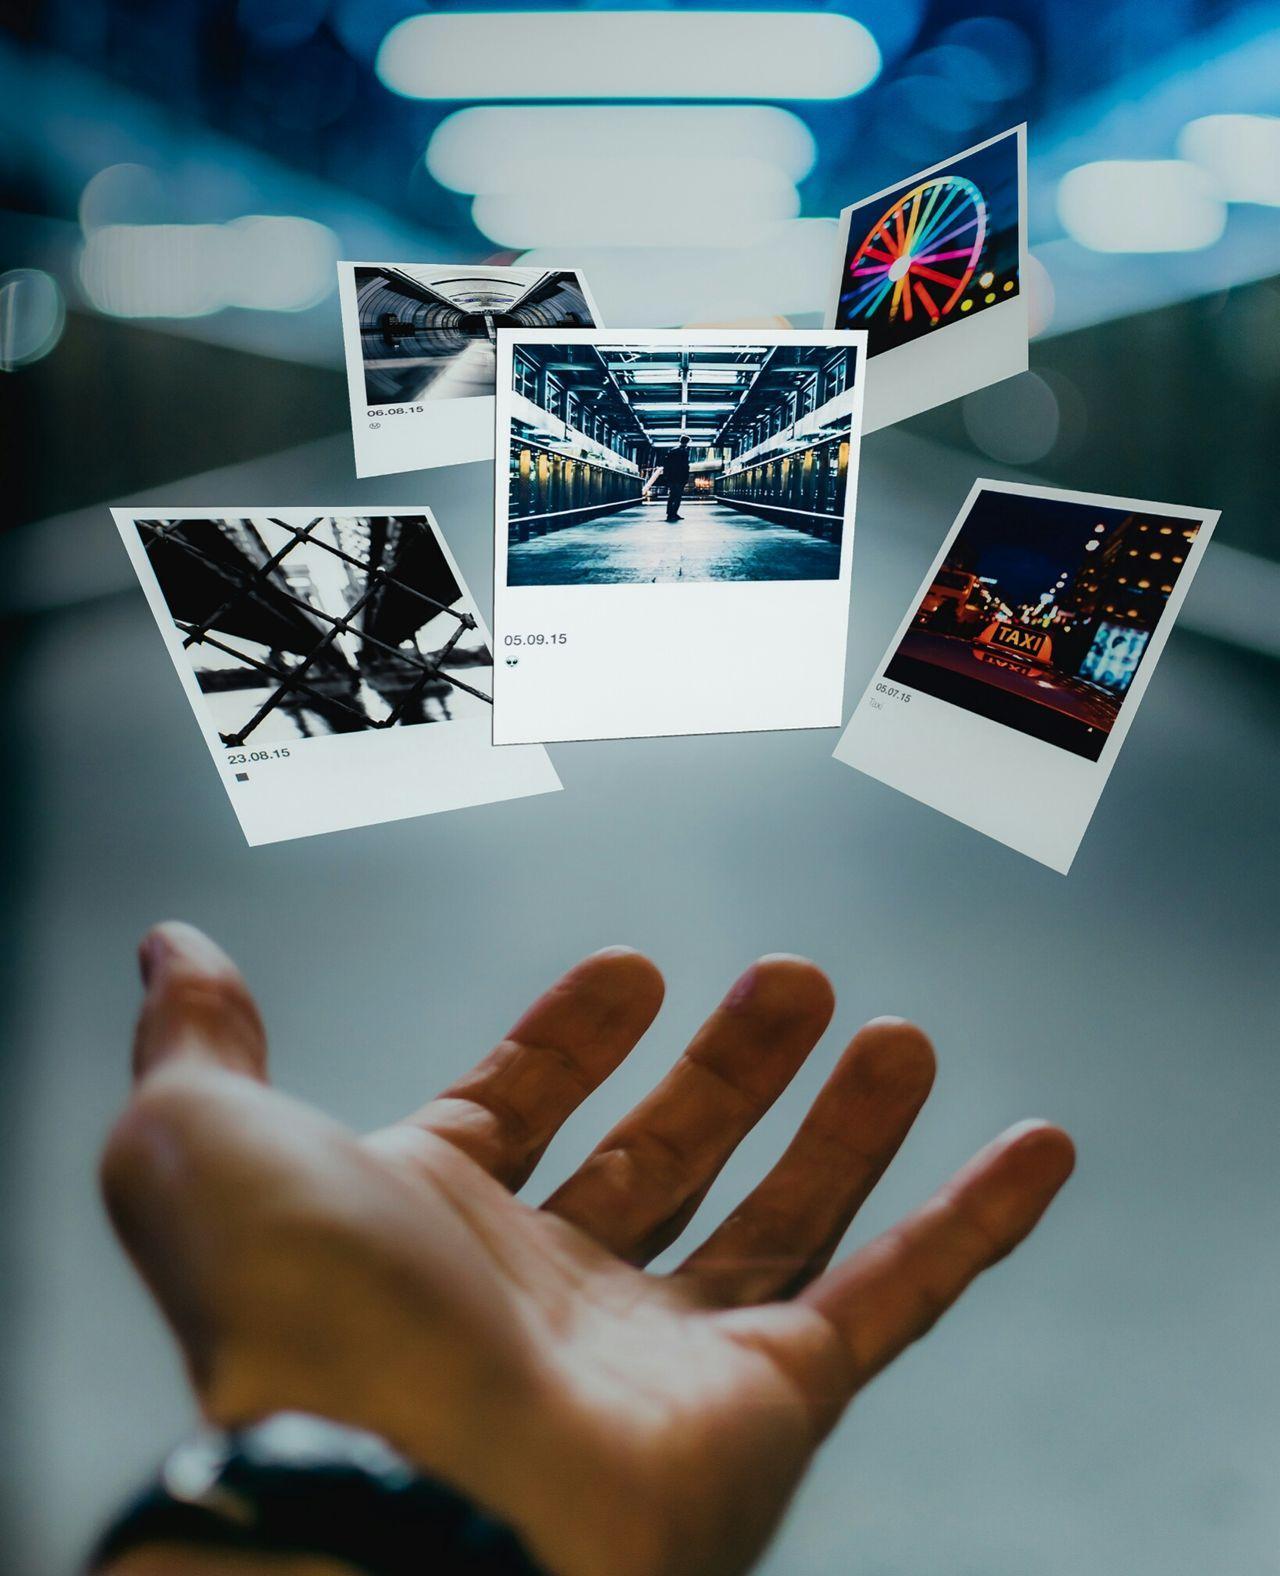 Night Photography City Streetdreamsmag Spb VSCO Cam VSCO Vscofilm Perfect Moment Cards